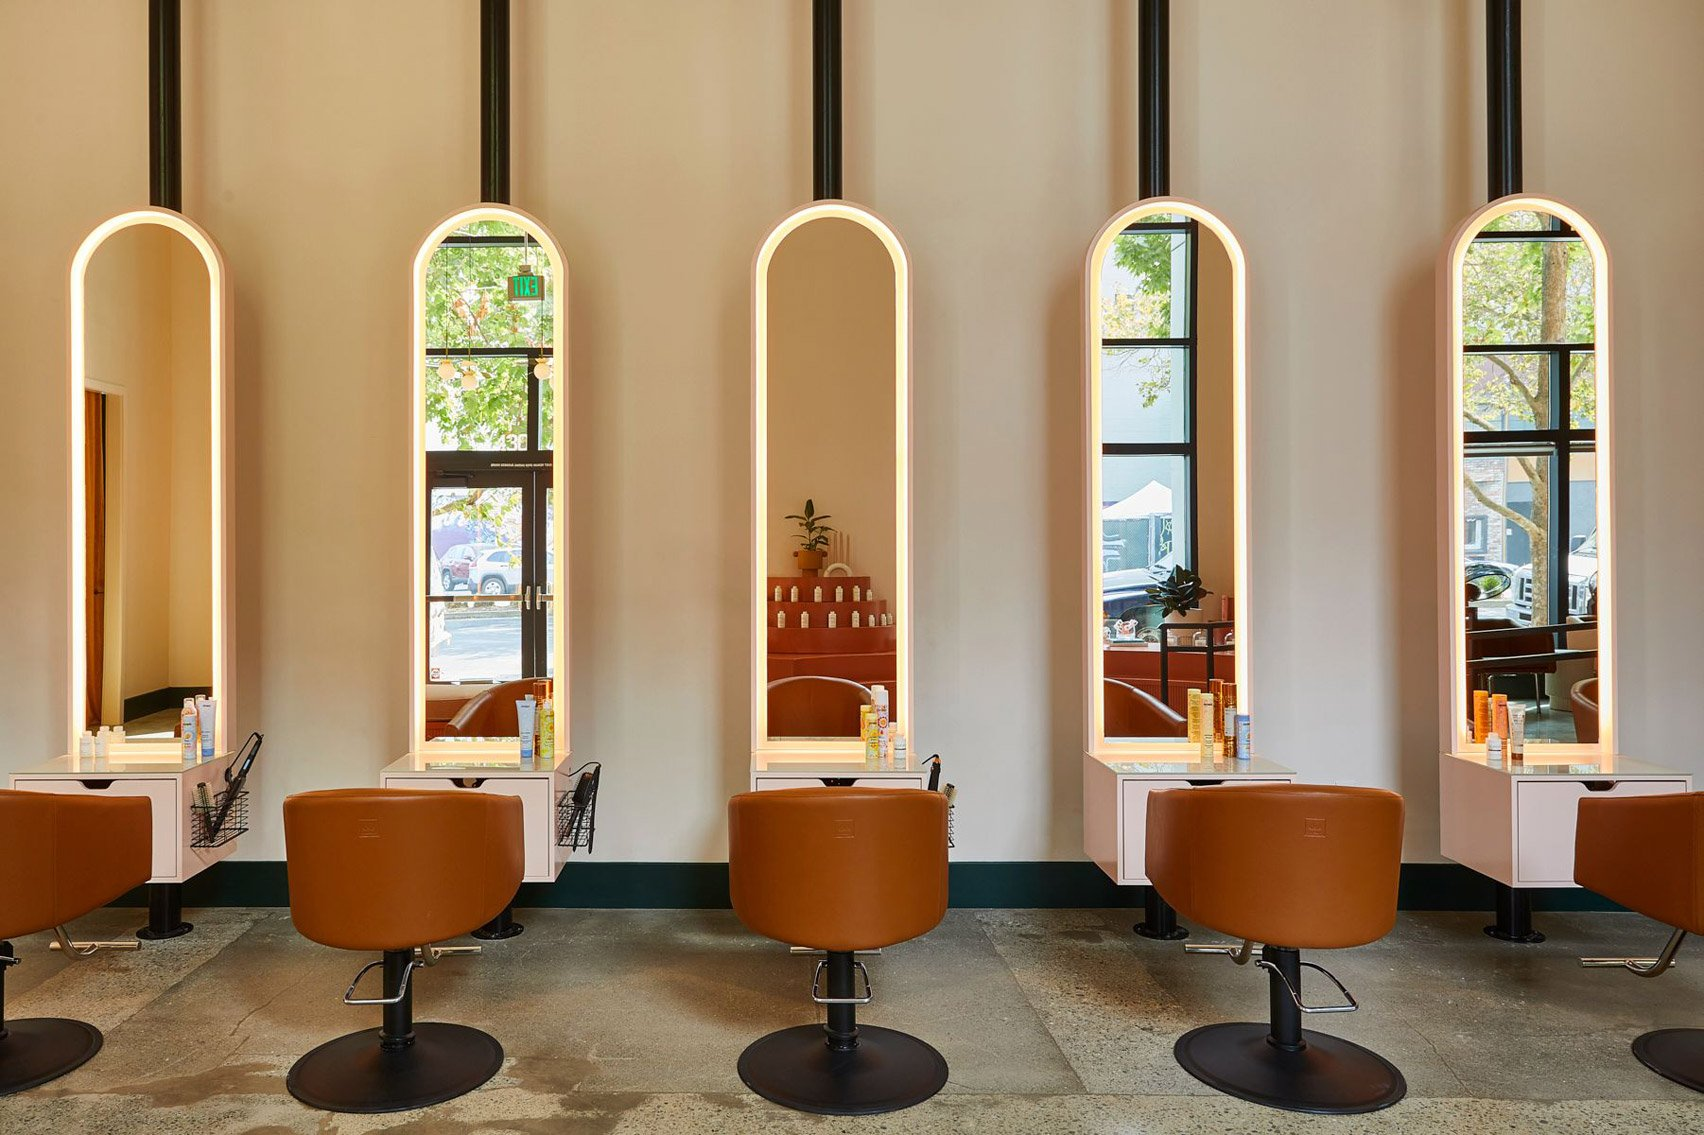 Interiors of GoodBody hair salon in Oakland, California